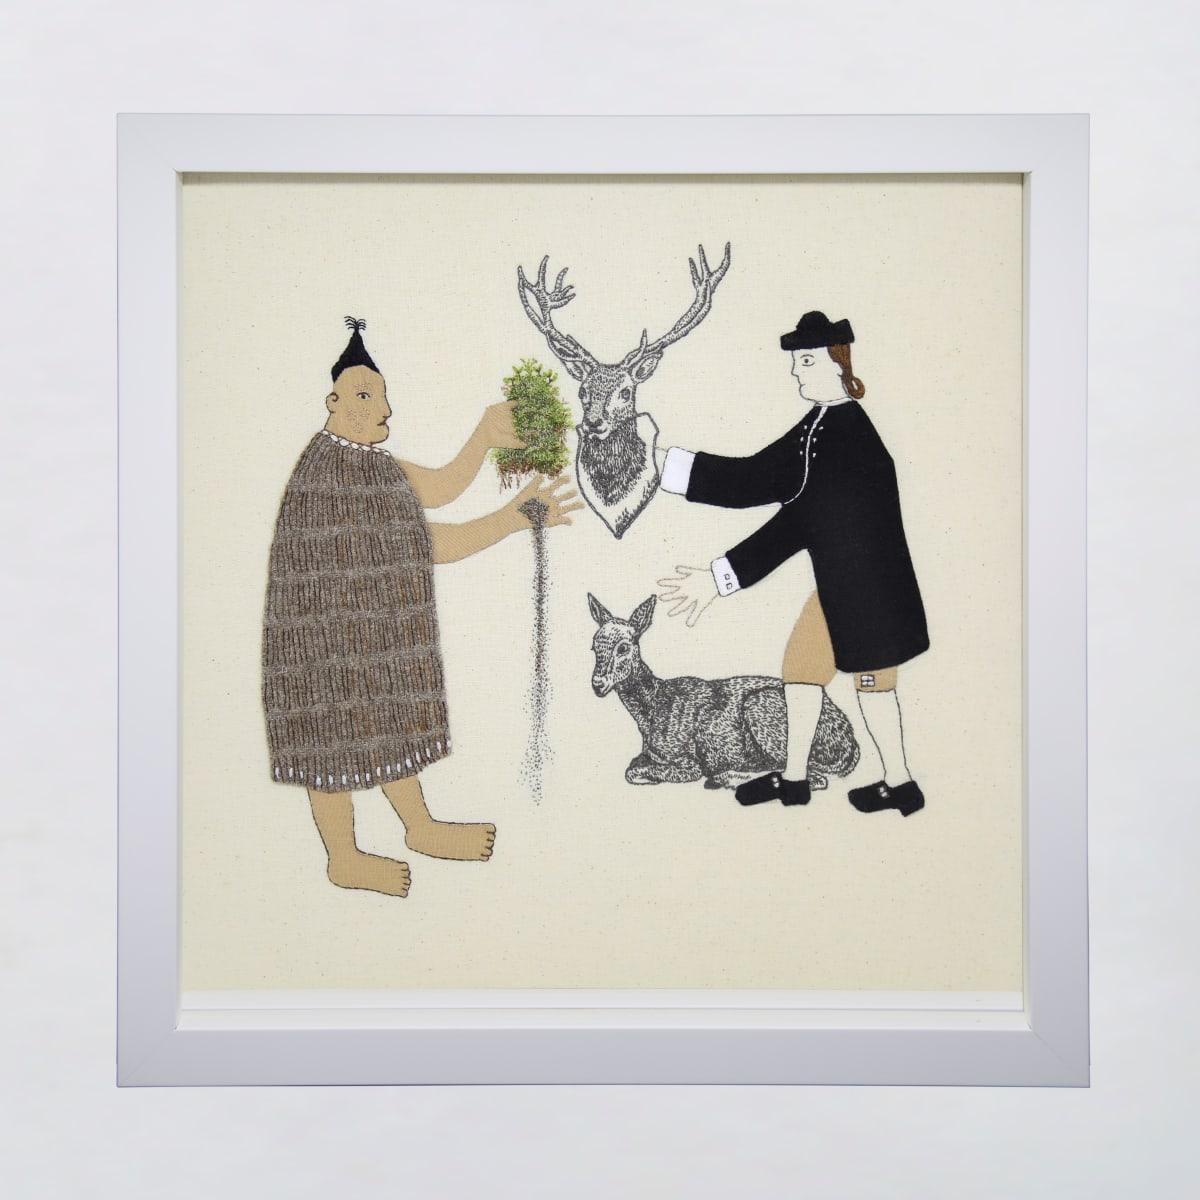 Sarah Munro Trade Items - Moss, Filmy Ferns, Deer, Erosion, 2019 cloth and thread 330mm x 330mm